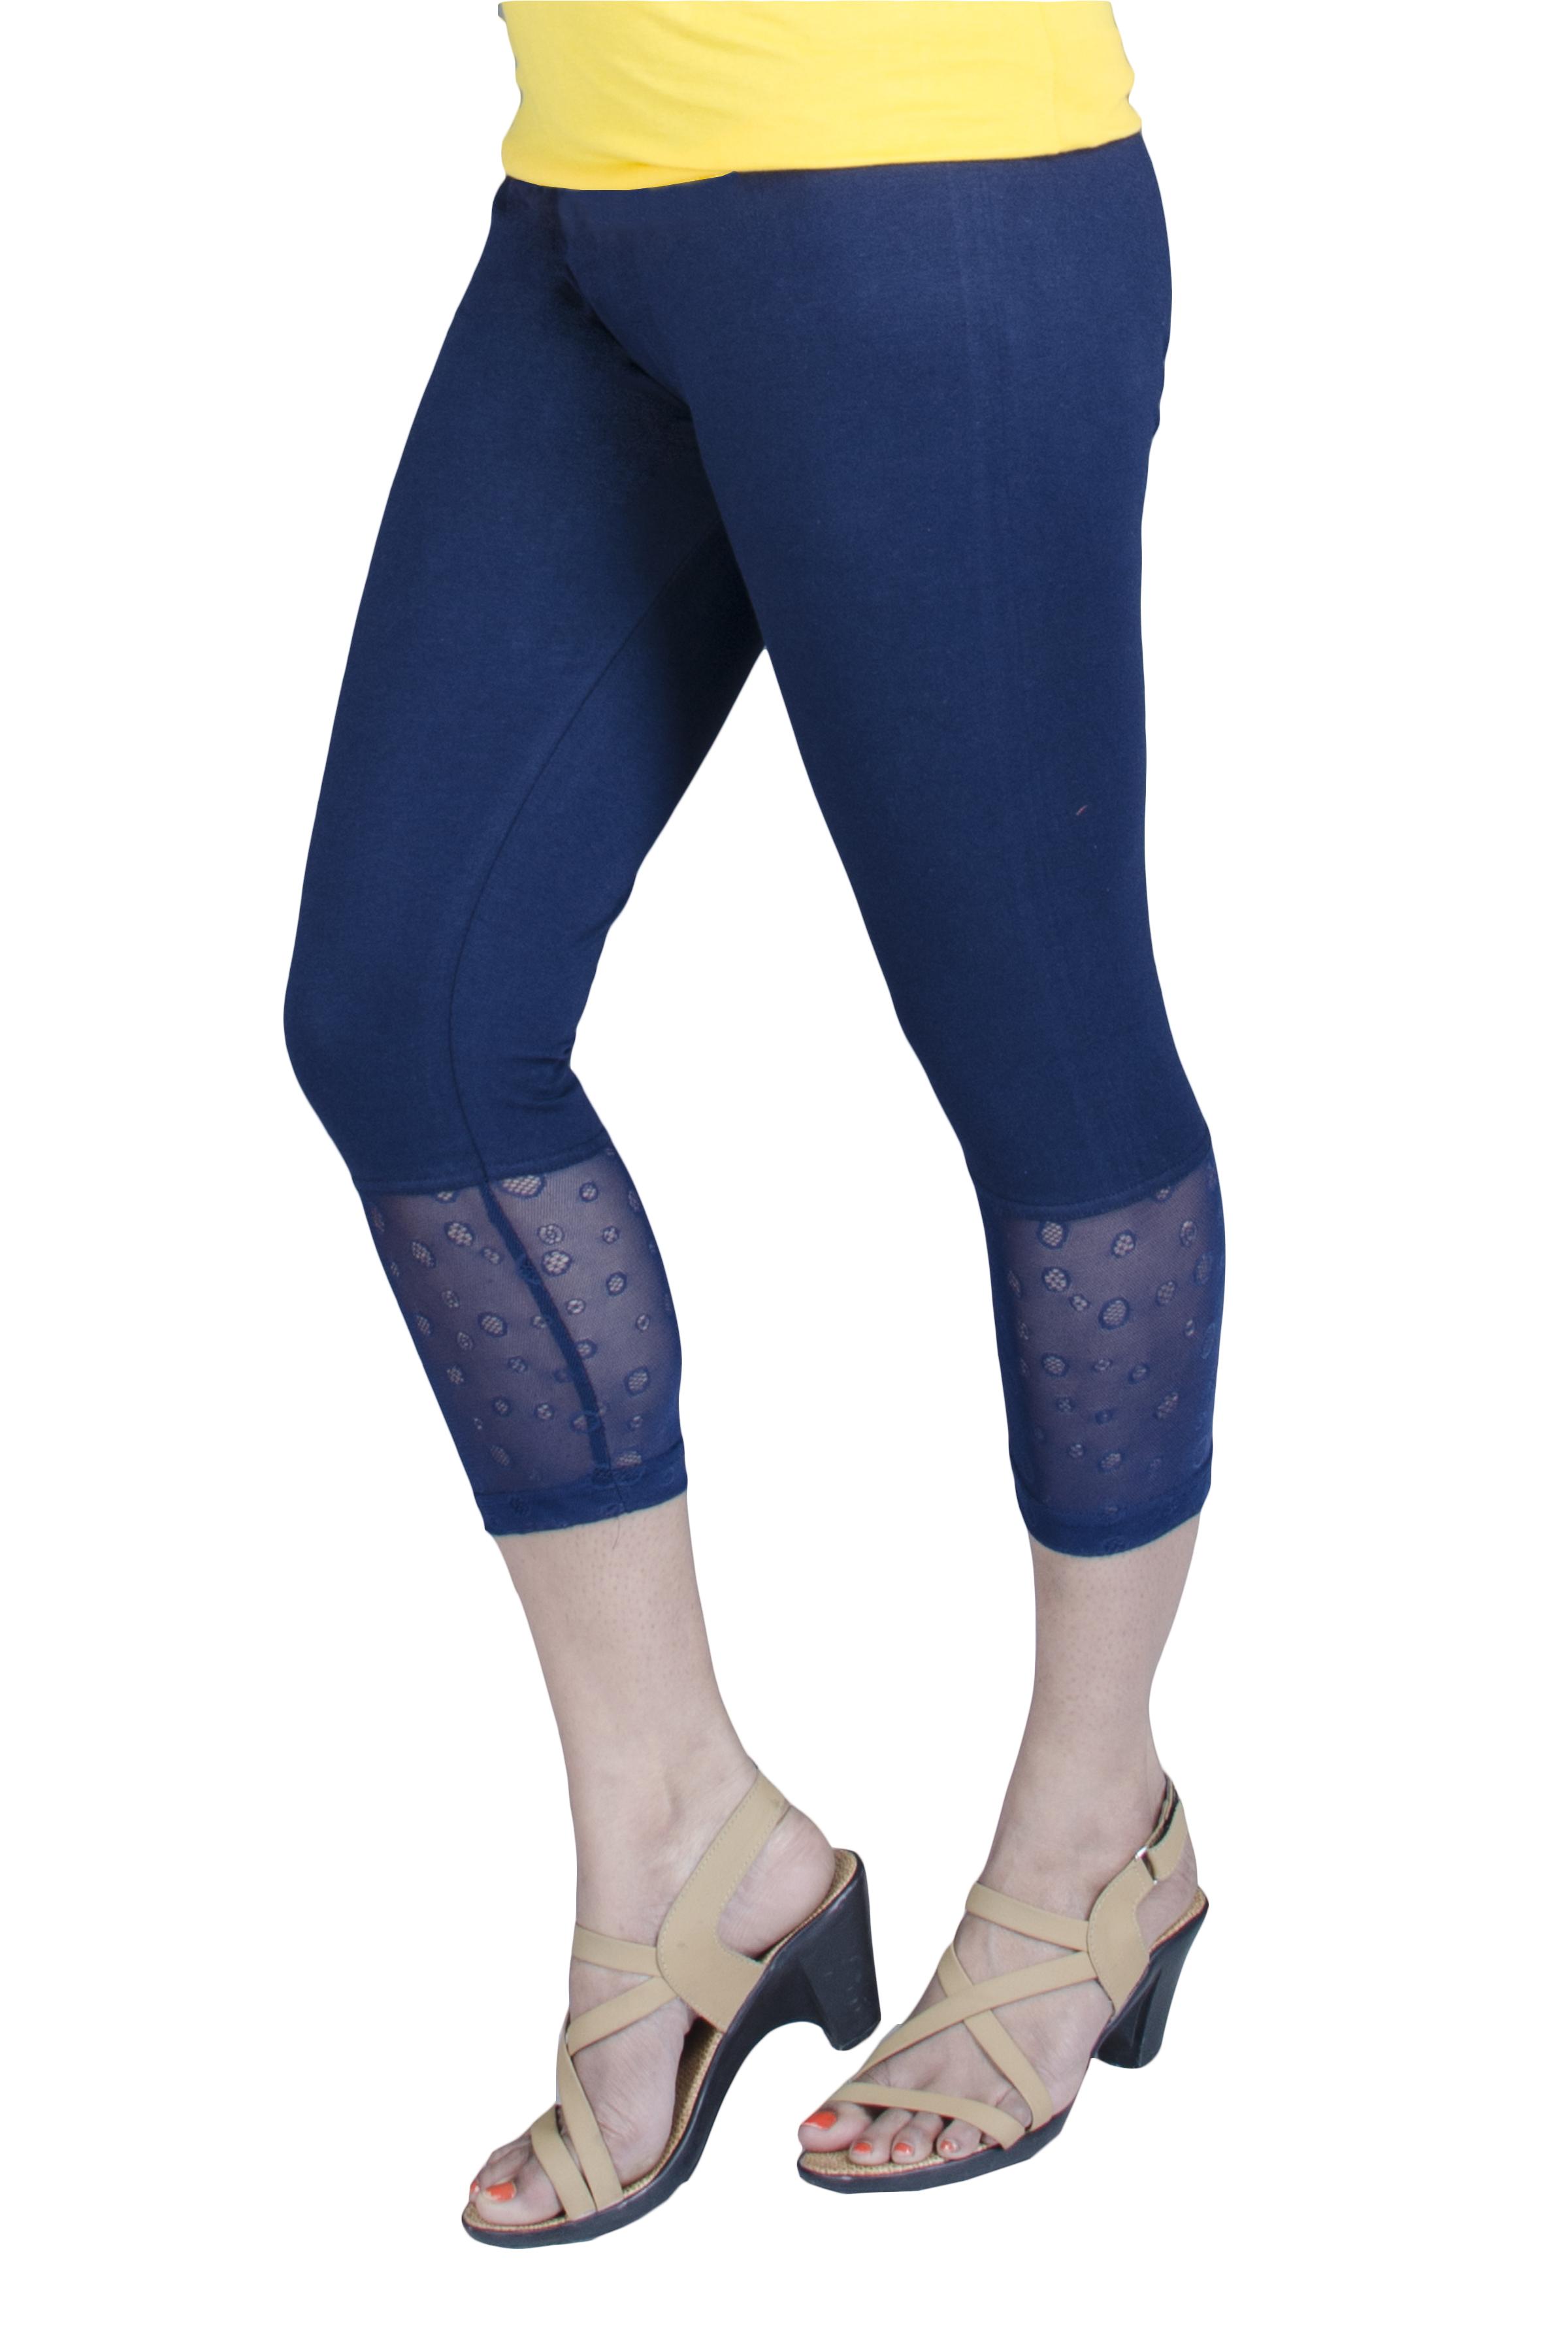 768beb1bb8cf35 Capri Leggings - Capri Leggings Exporter, Manufacturer & Supplier ...